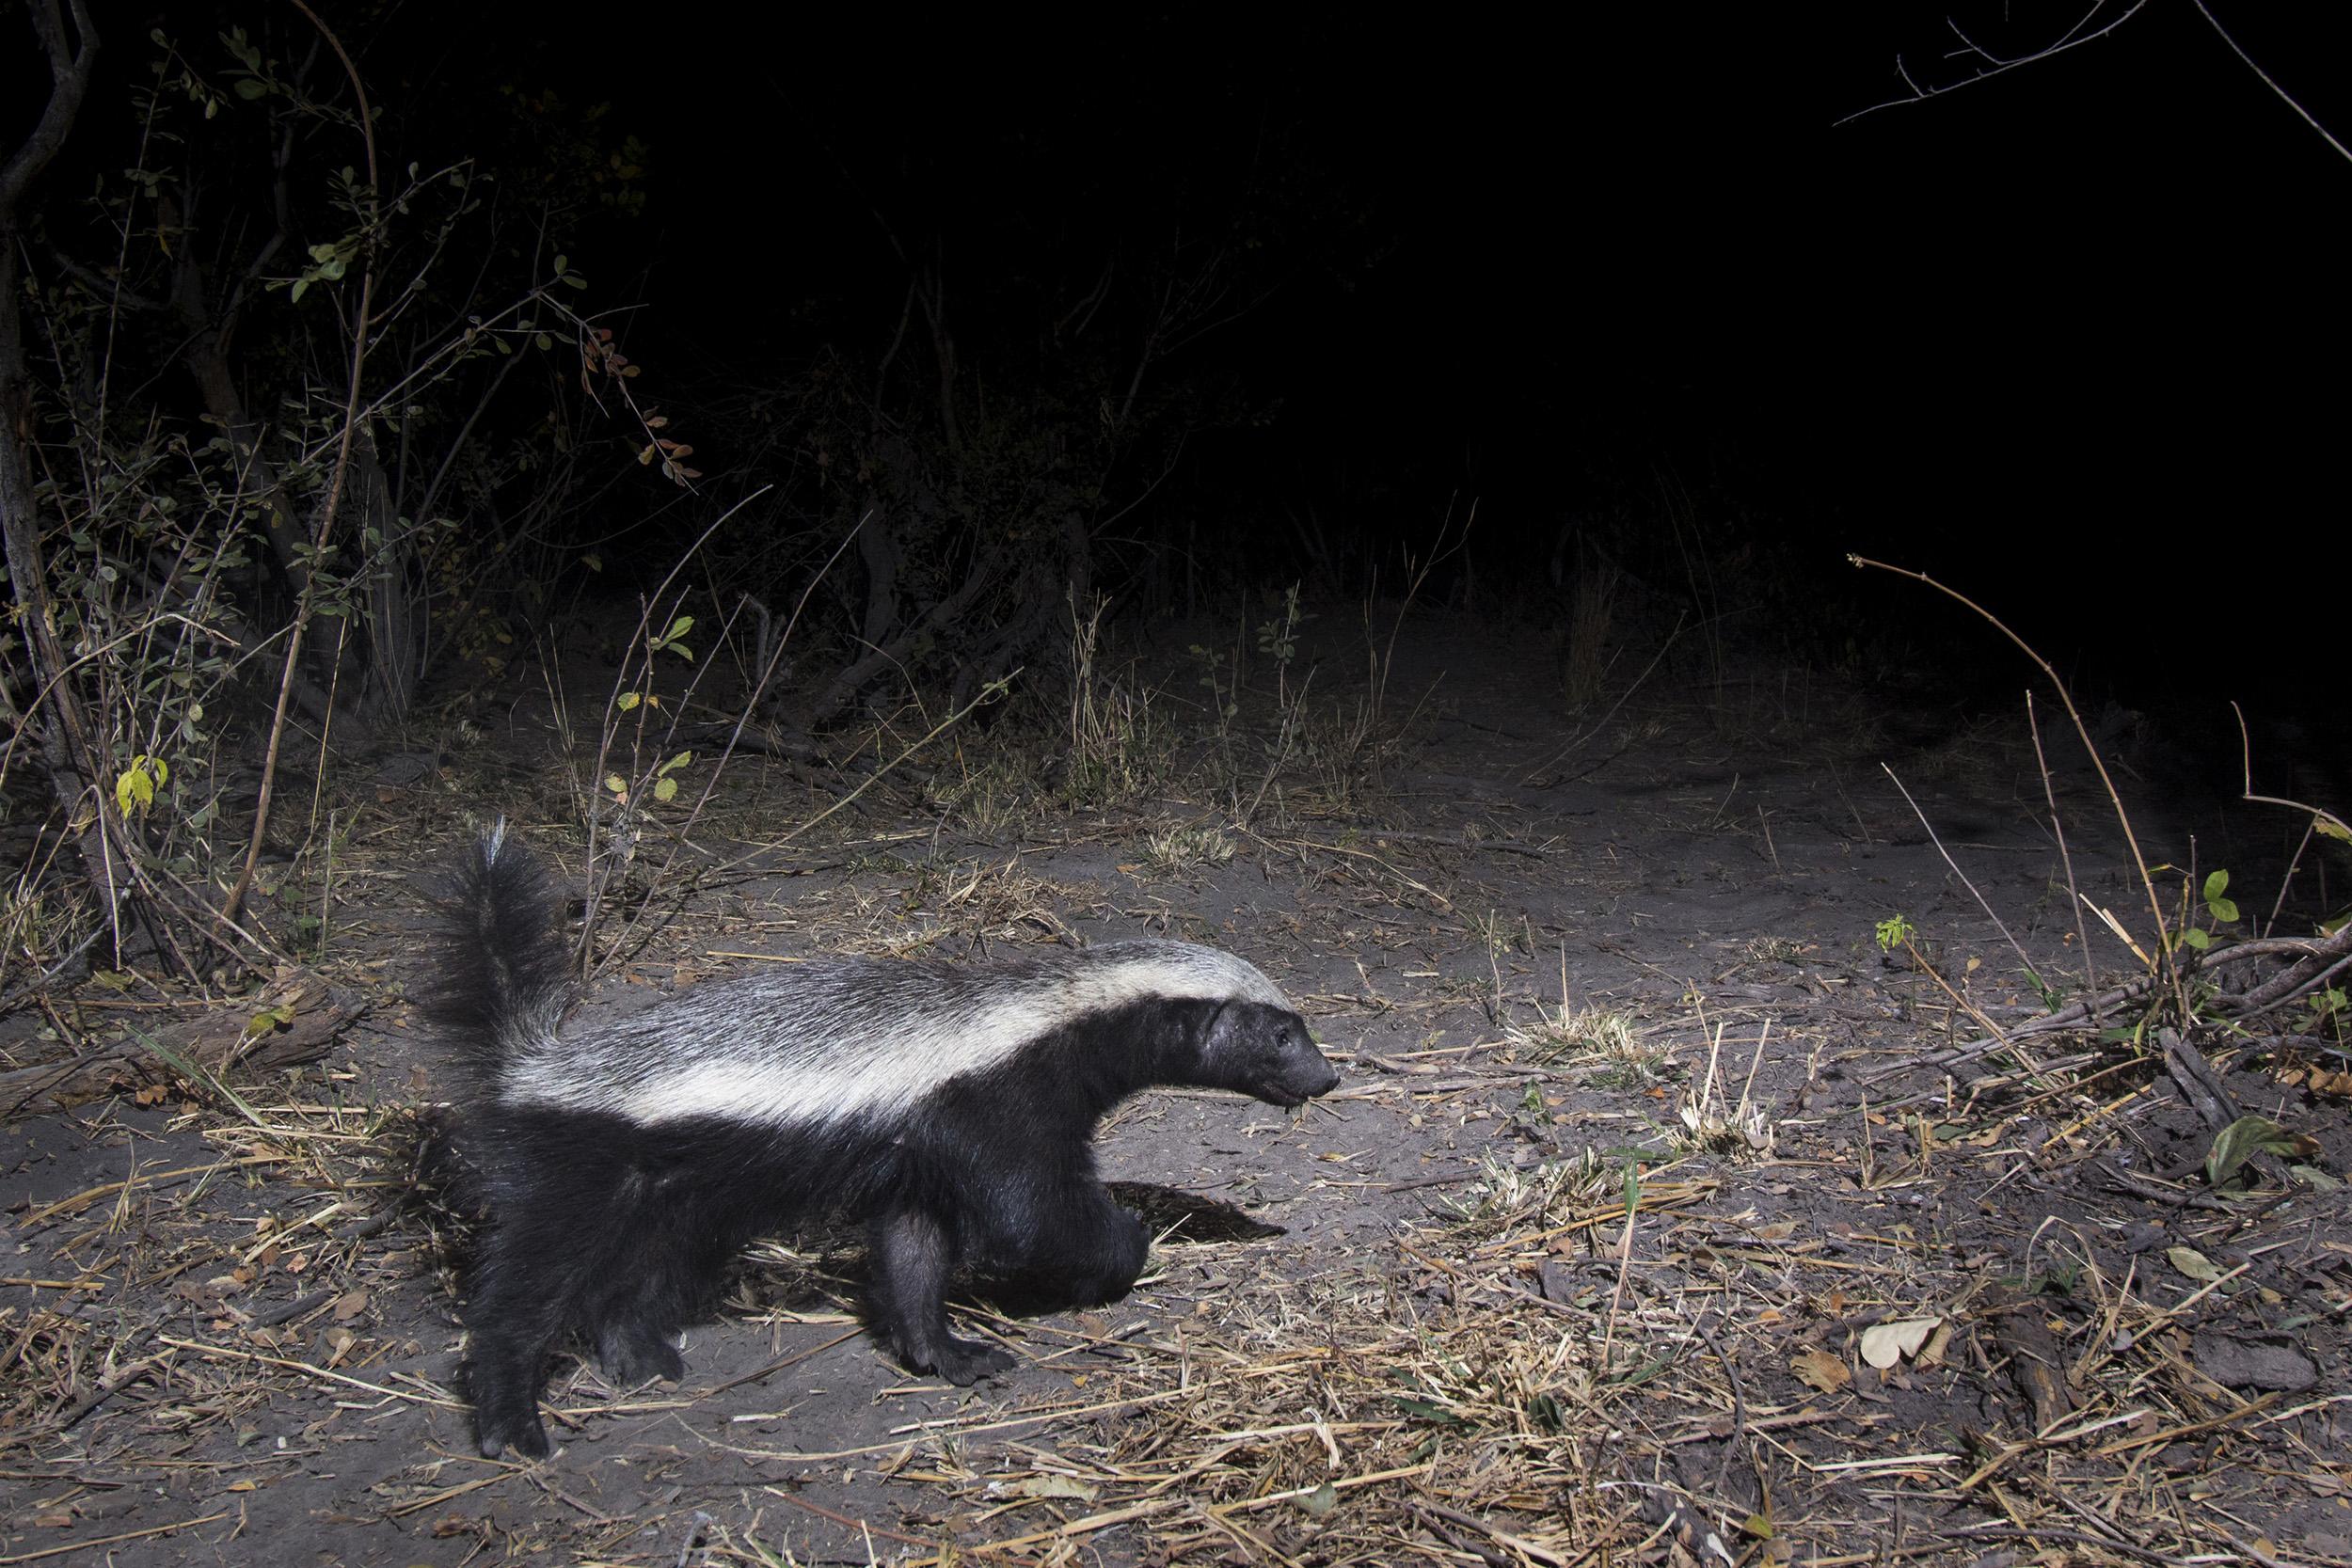 A camera trap image of a honey badger using Camtraptions PIR motion sensor.